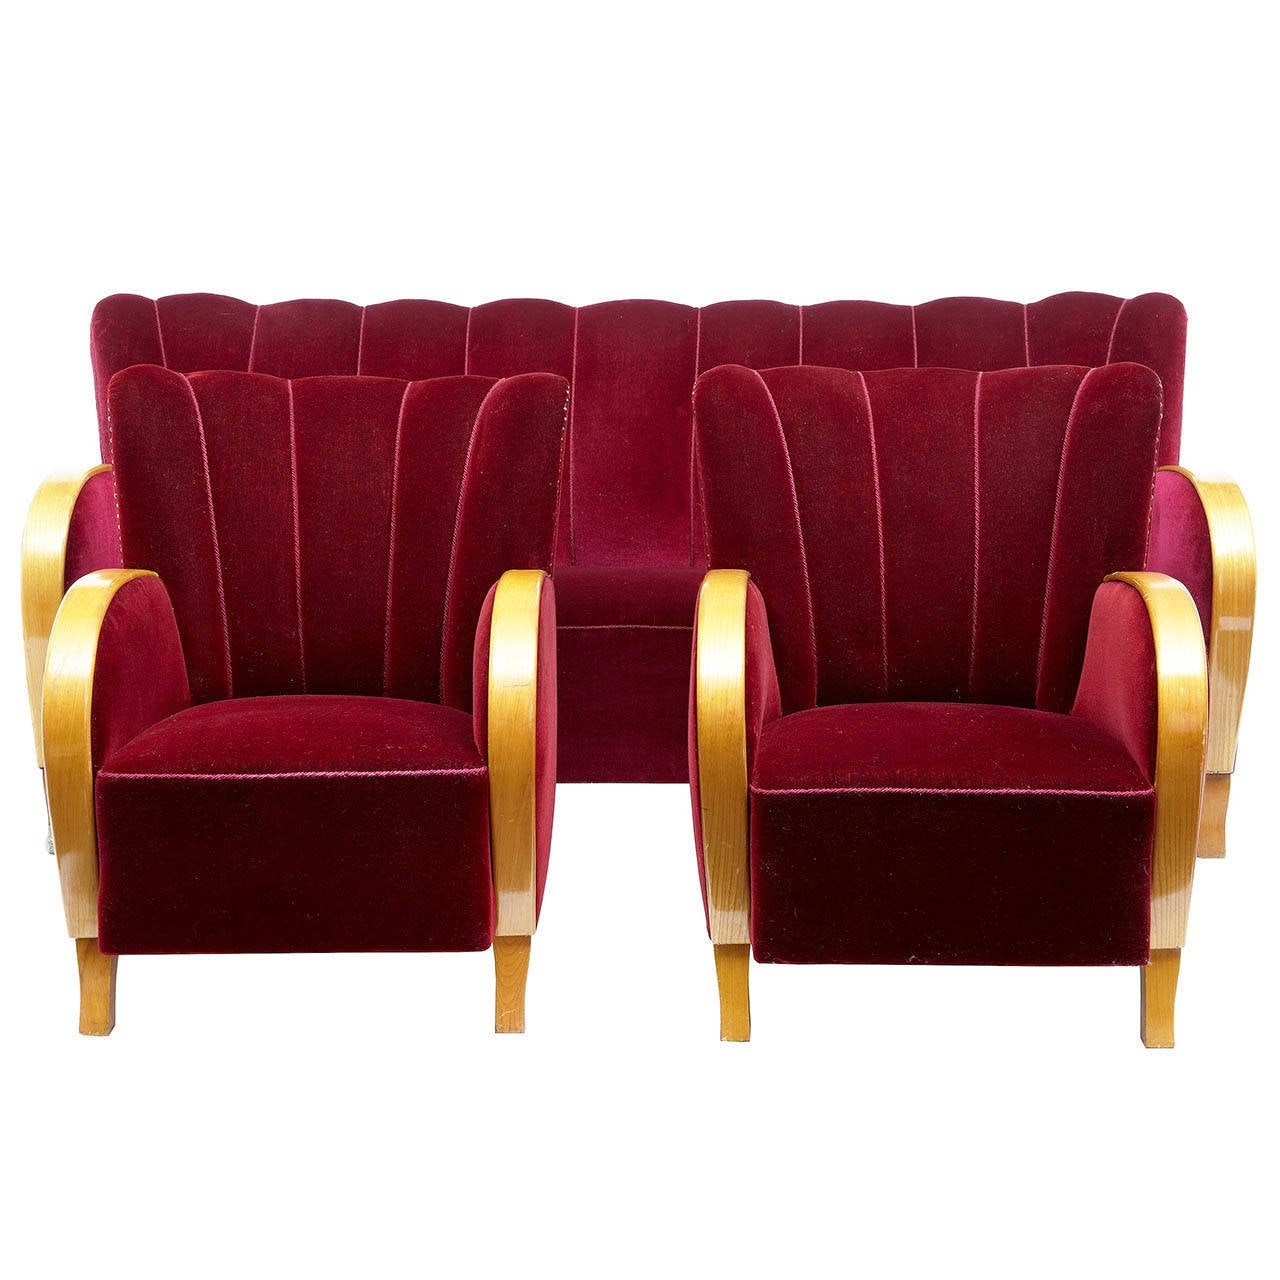 1960s Retro Modern Shell Back Three Piece Suite of Sofa